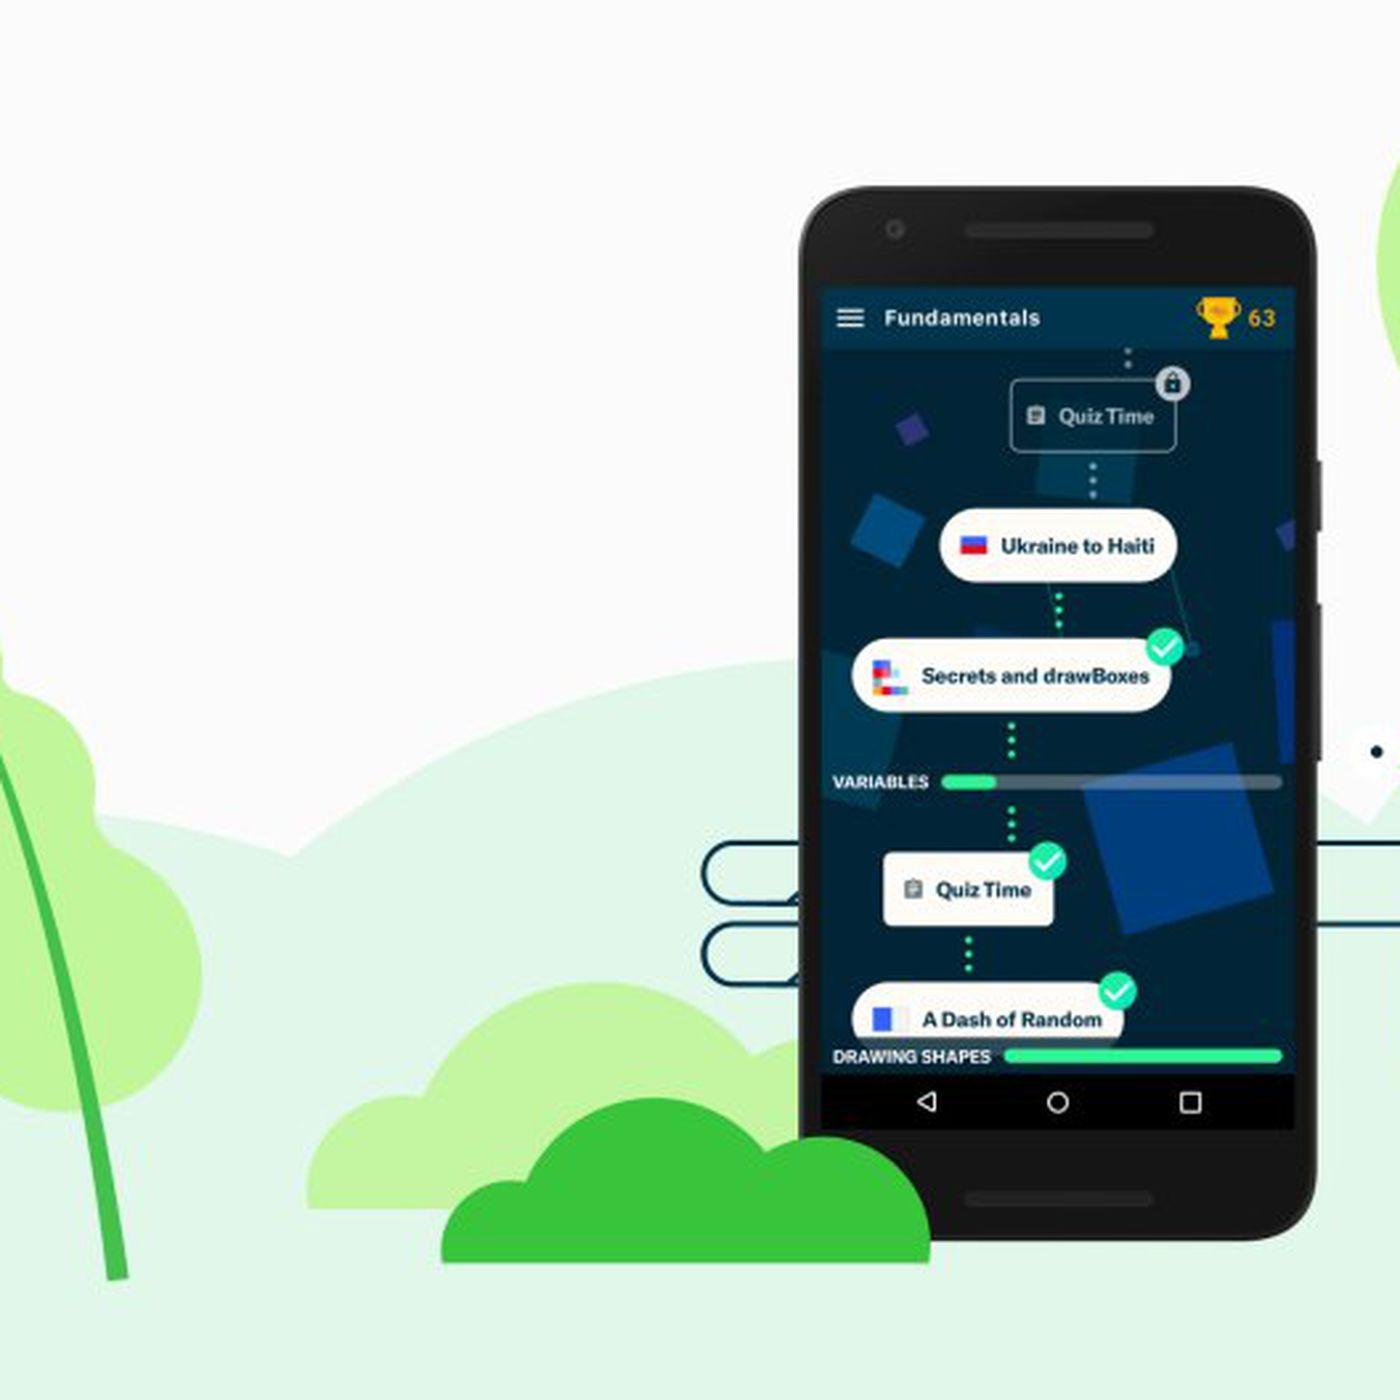 Grasshopper is an app for learning JavaScript through mini